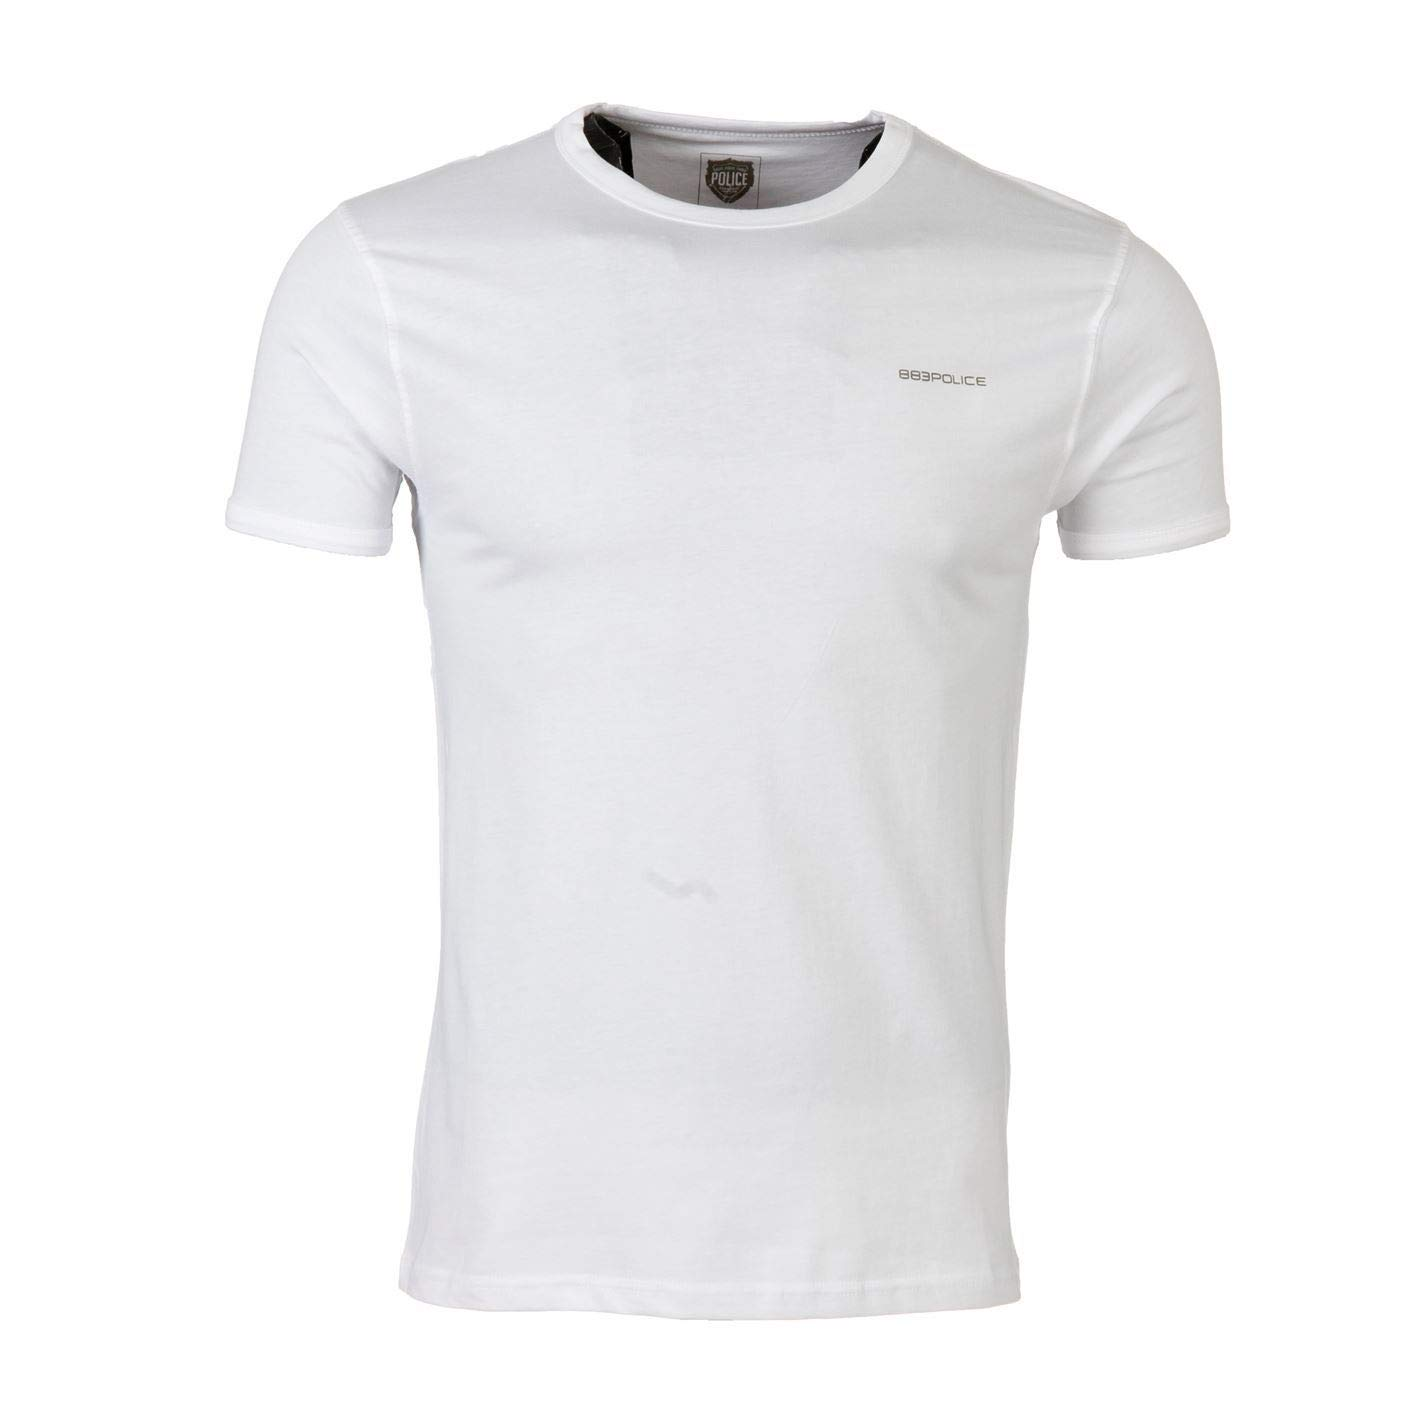 883 Police Underwear T-Shirt Mens Tee Shirt Top